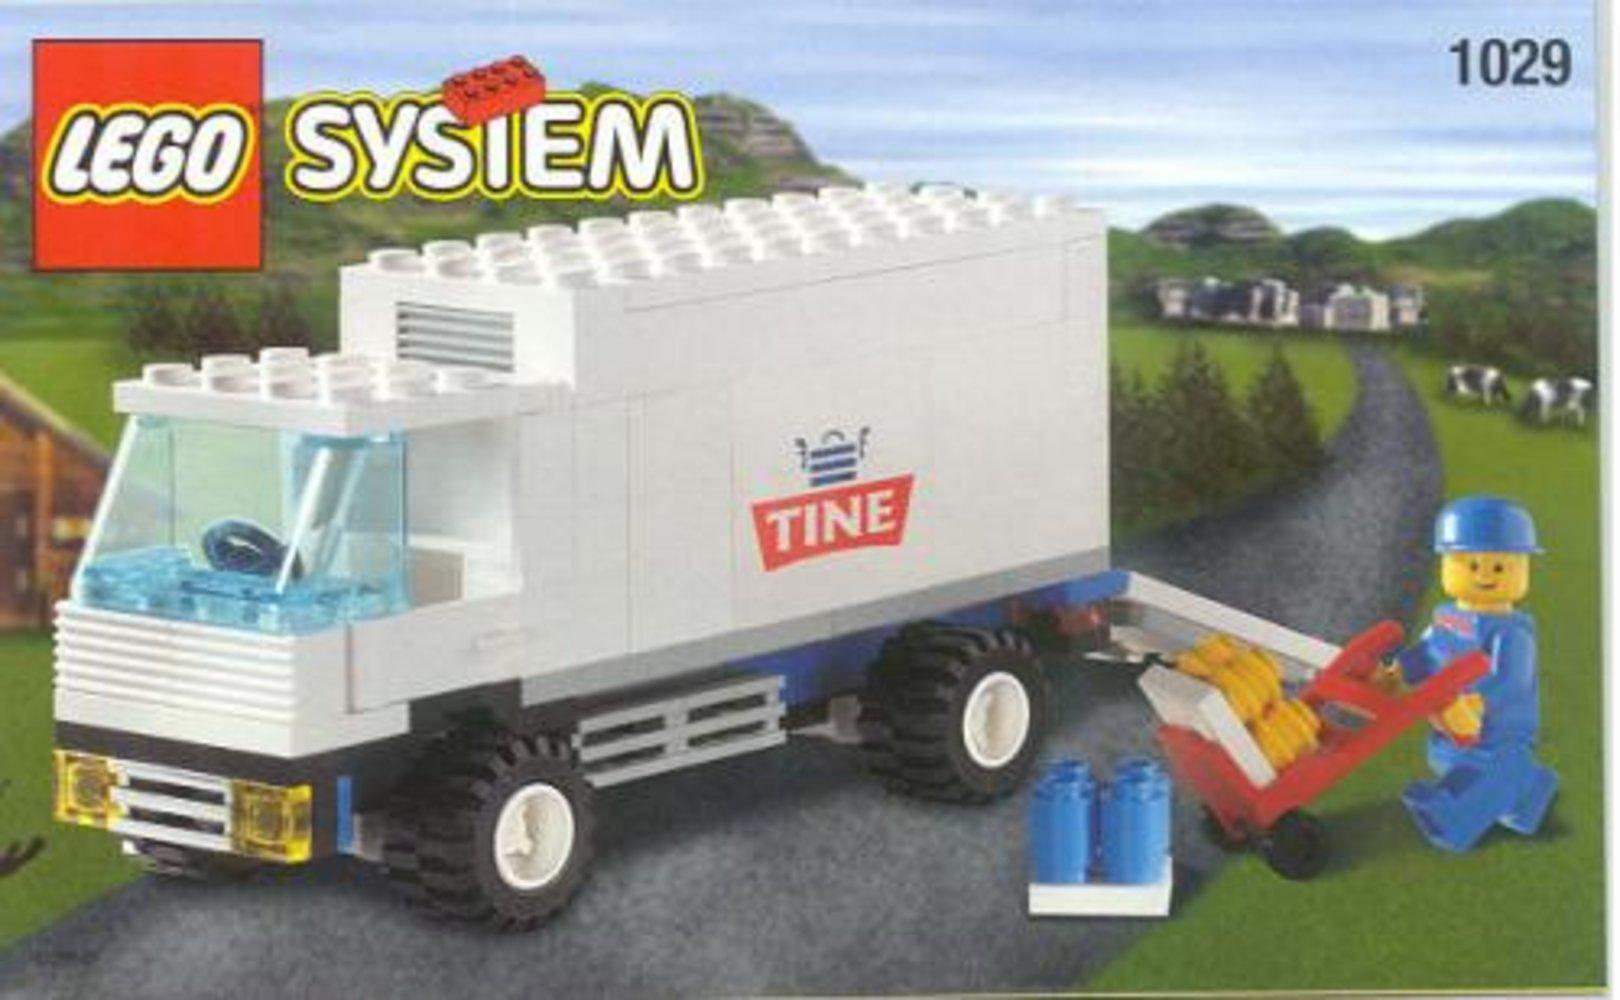 Milk Delivery Truck - Tine